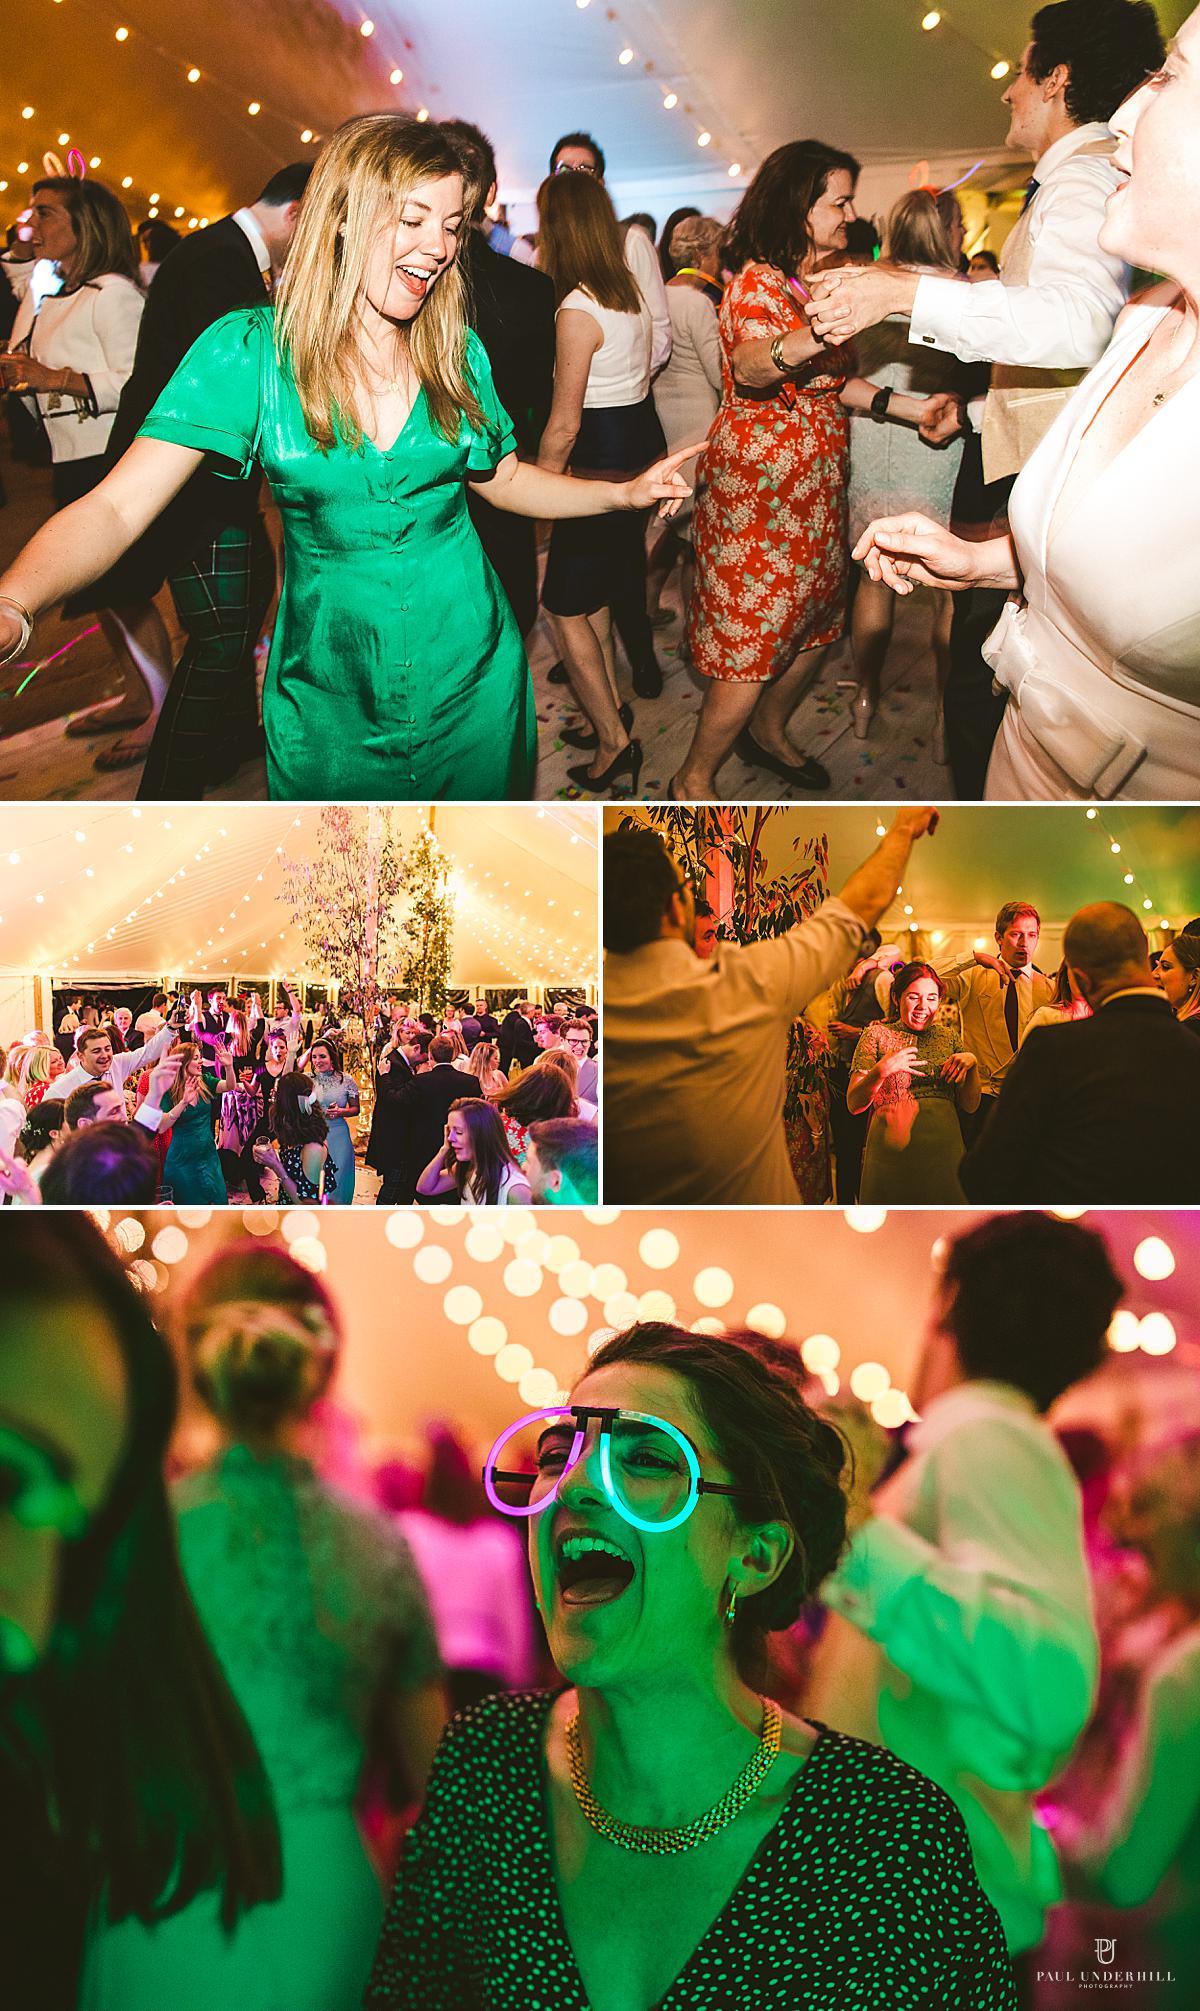 Reportage wedding photography party antics